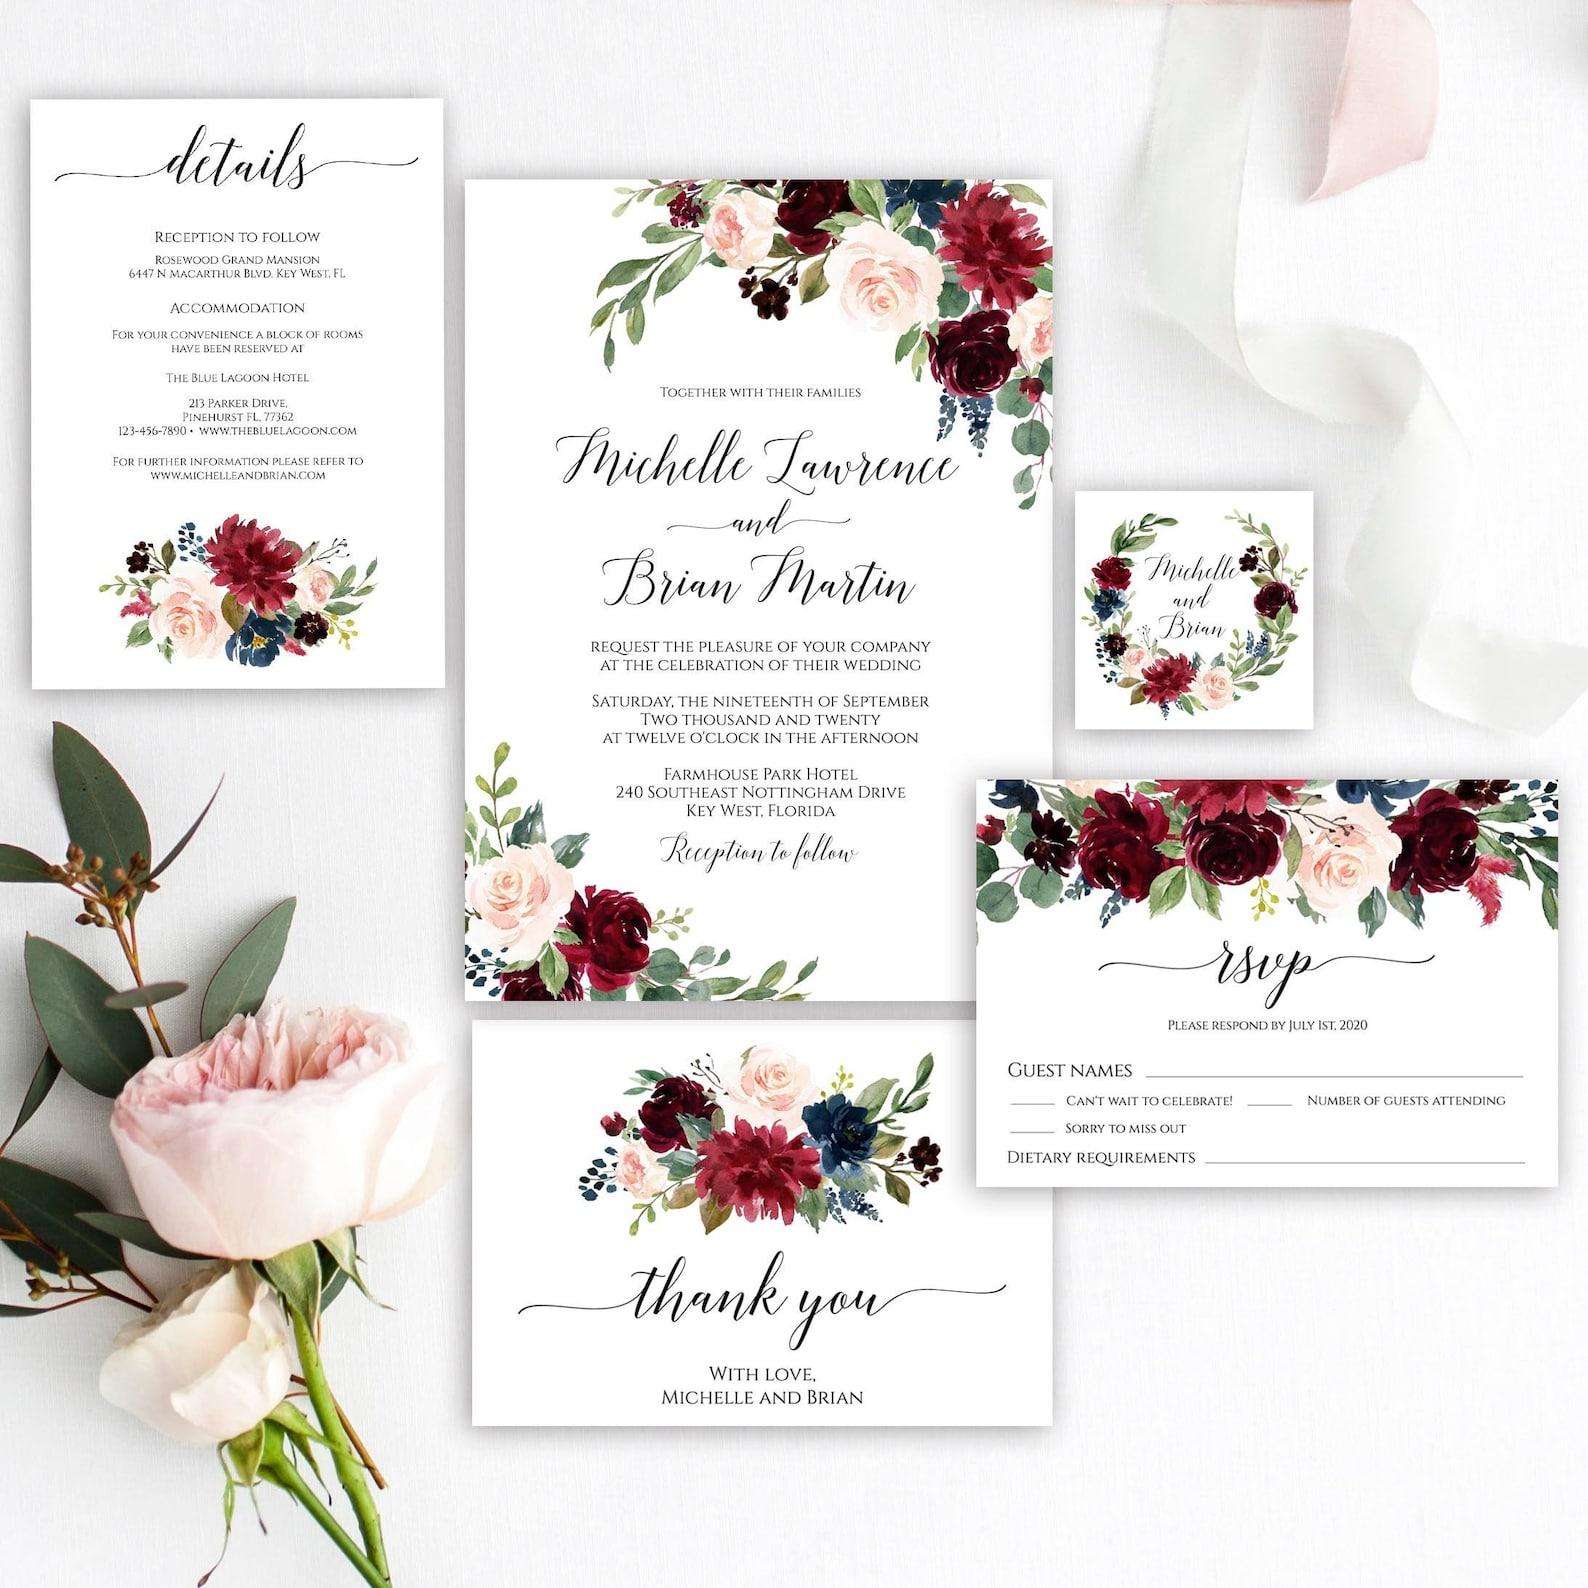 Burgundy and blush floral wedding invitation